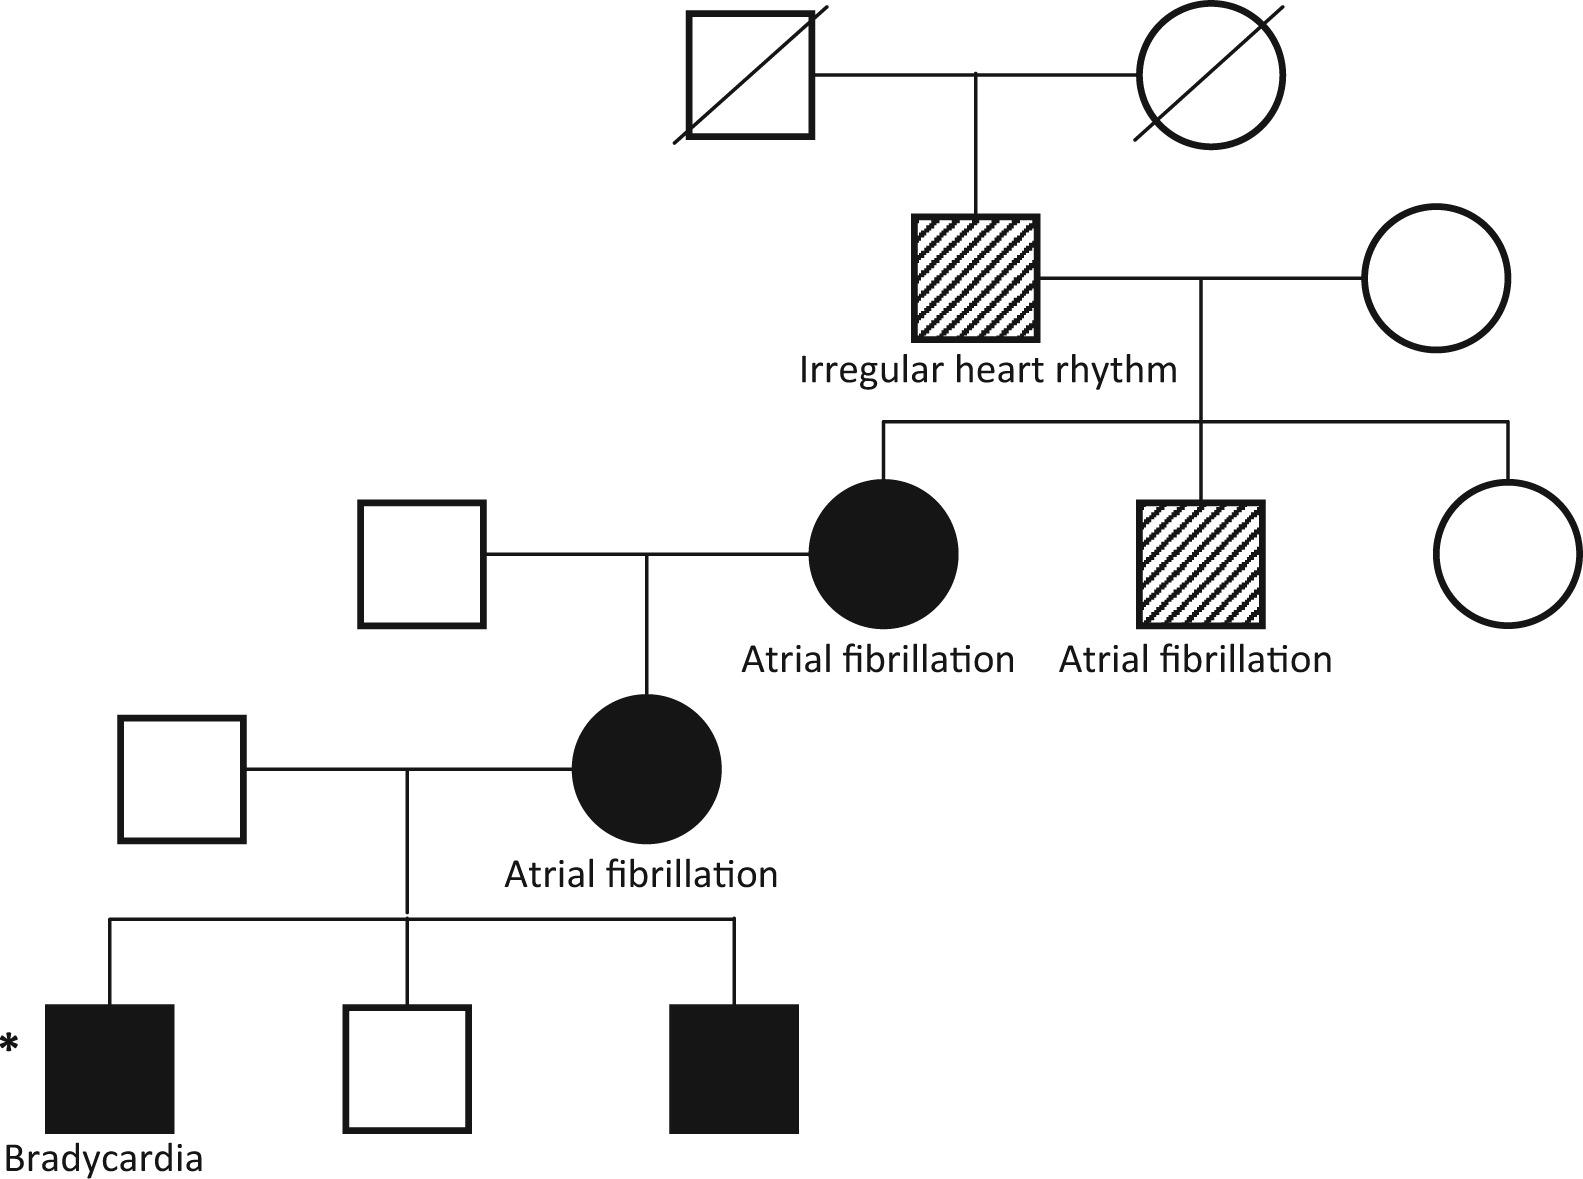 Long Qt Genetics Manifesting As Atrial Fibrillation